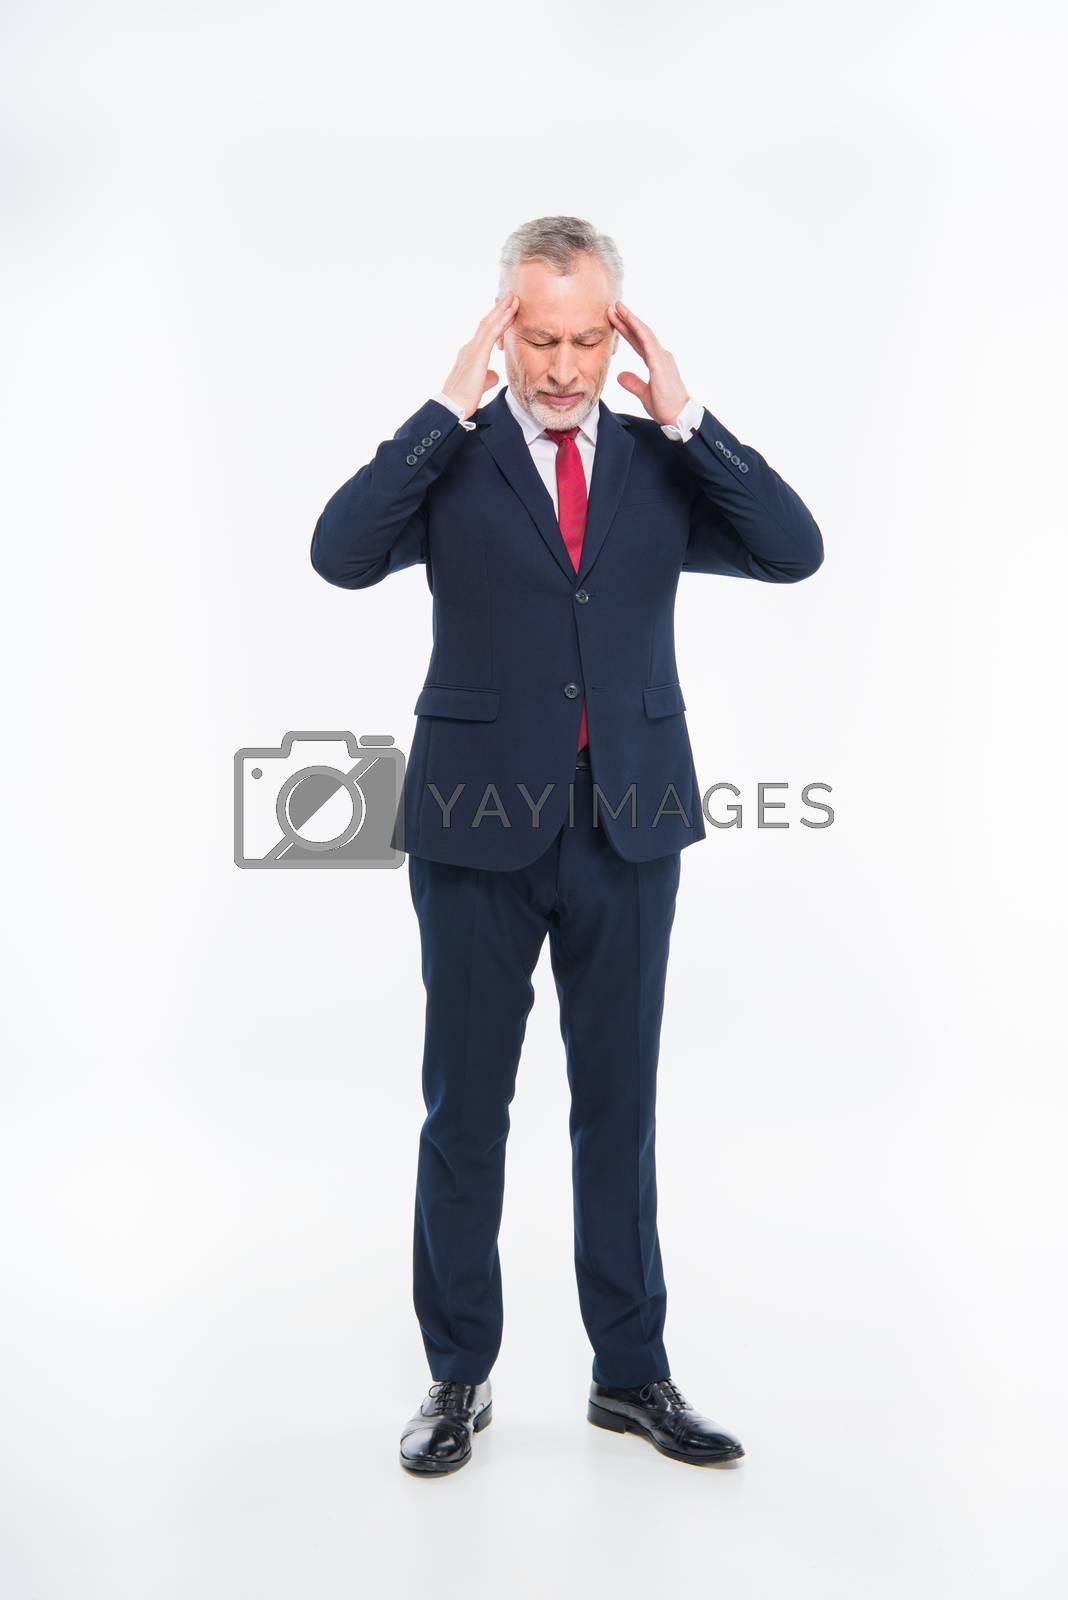 Royalty free image of Stressed mature businessman by LightFieldStudios